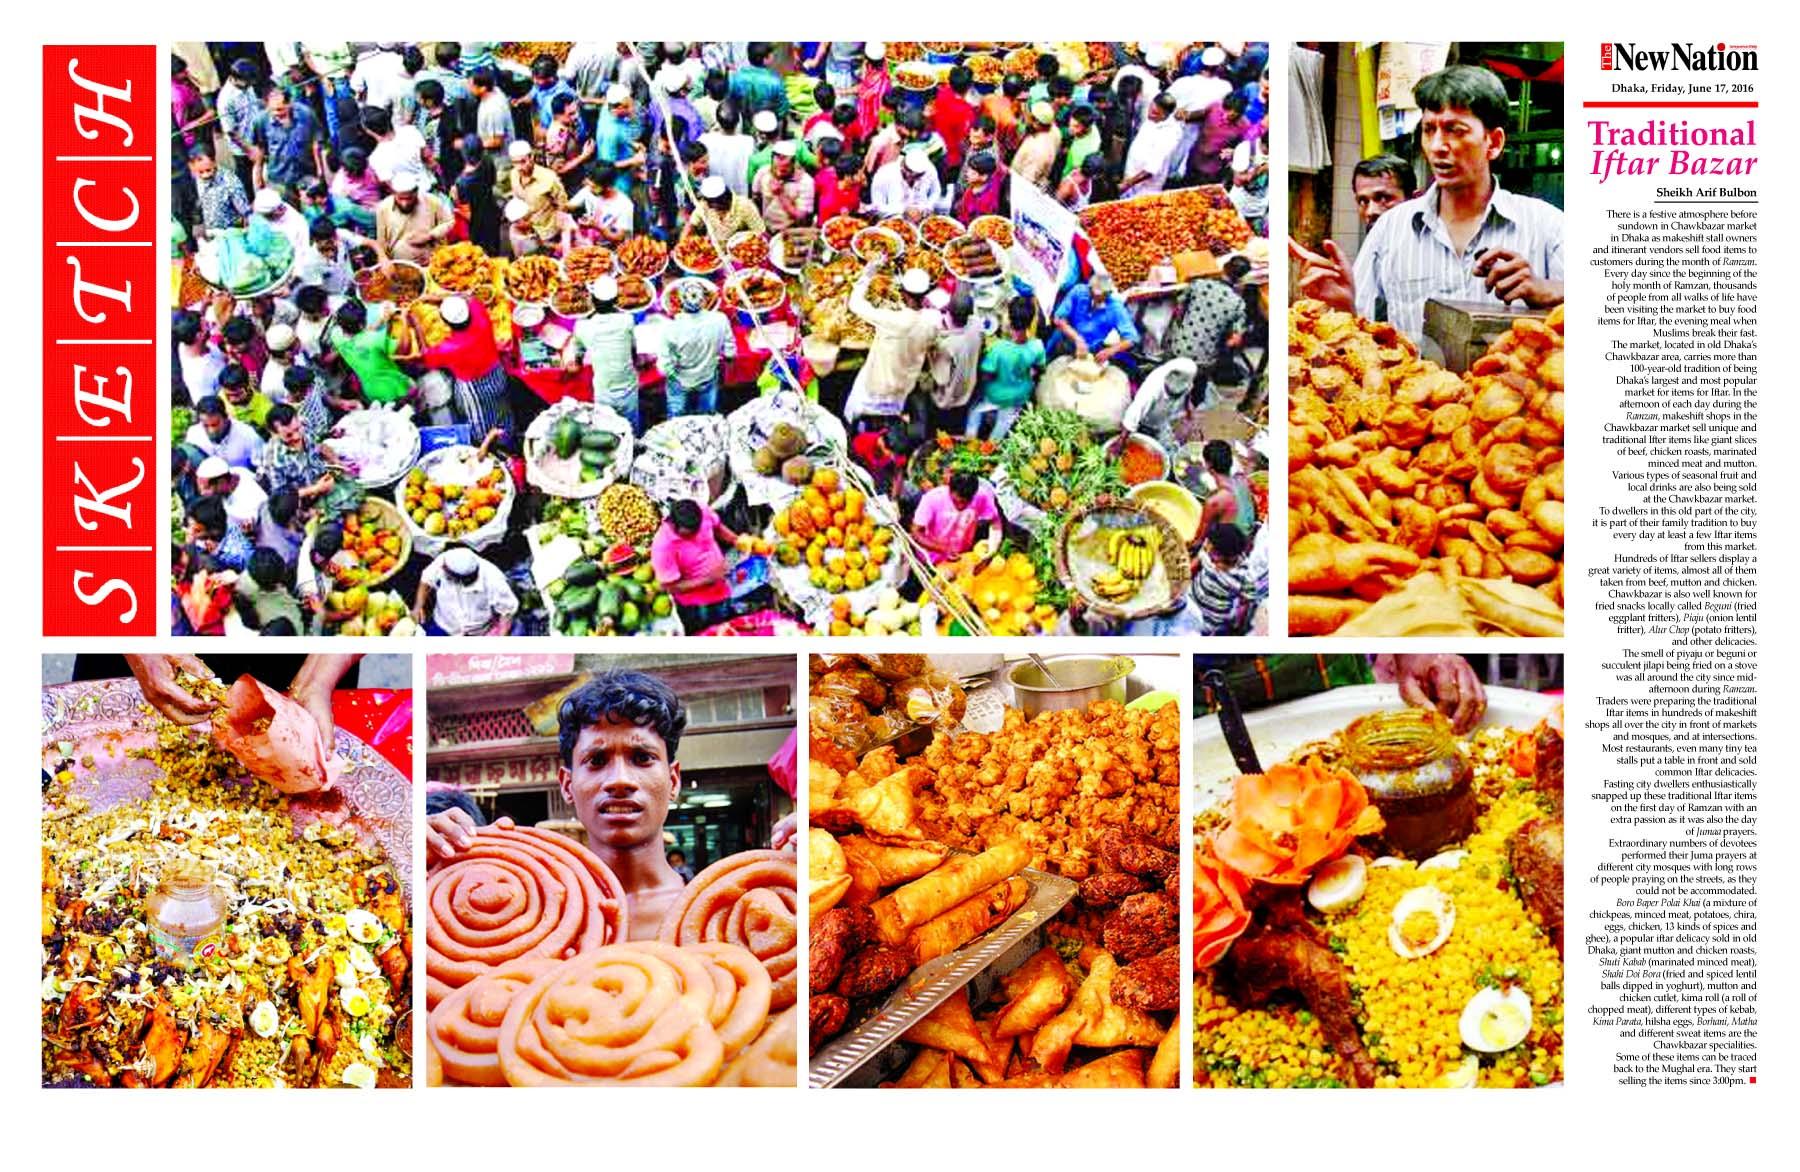 Traditional Iftar Bazar